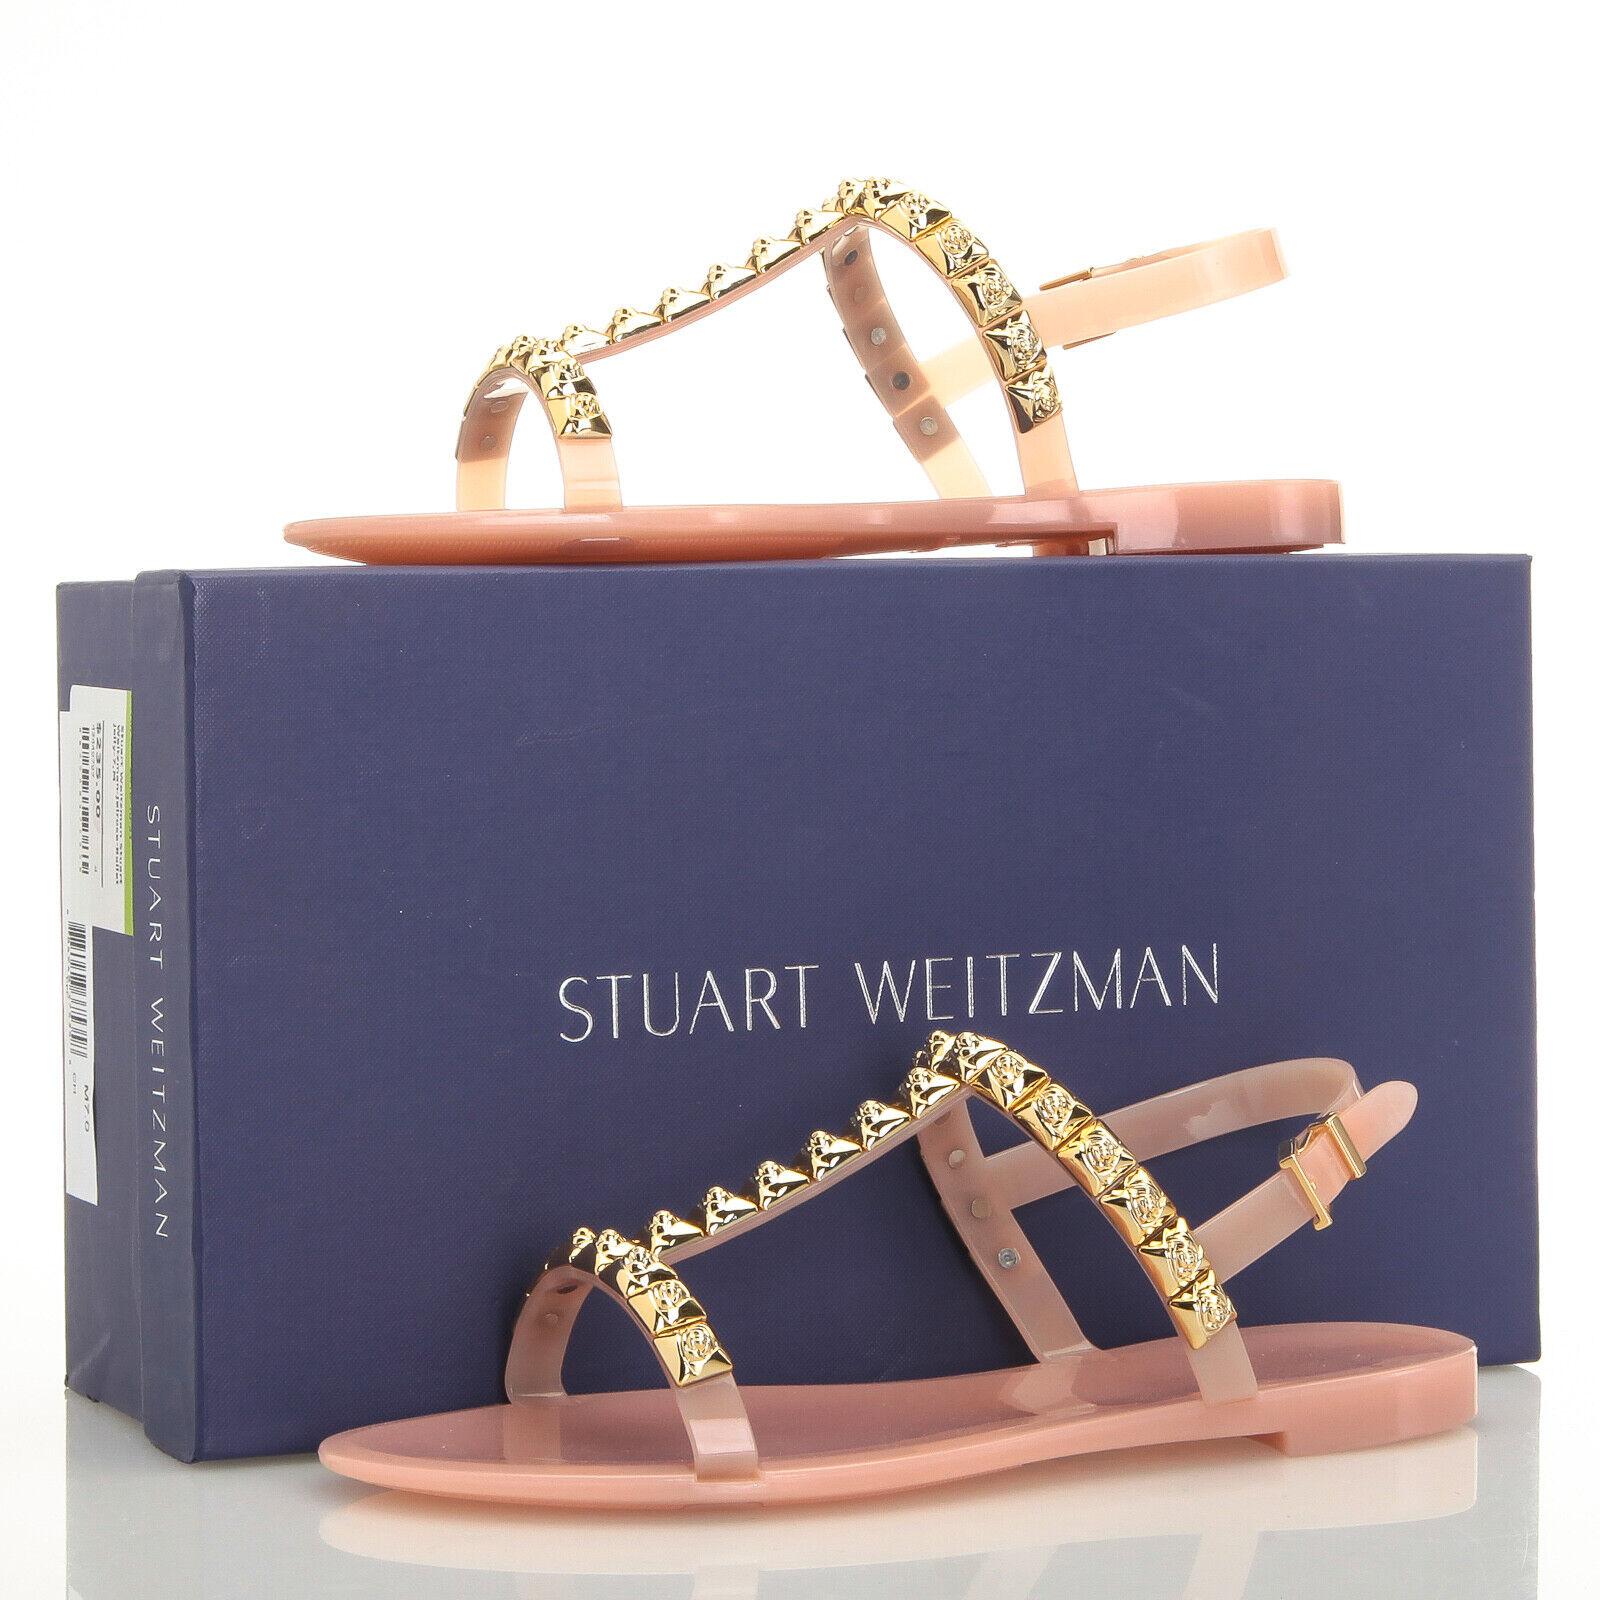 Stuart Weitzman Jelrosa Studded T-Strap rosa Jelly Sandals - Dimensione 7 M